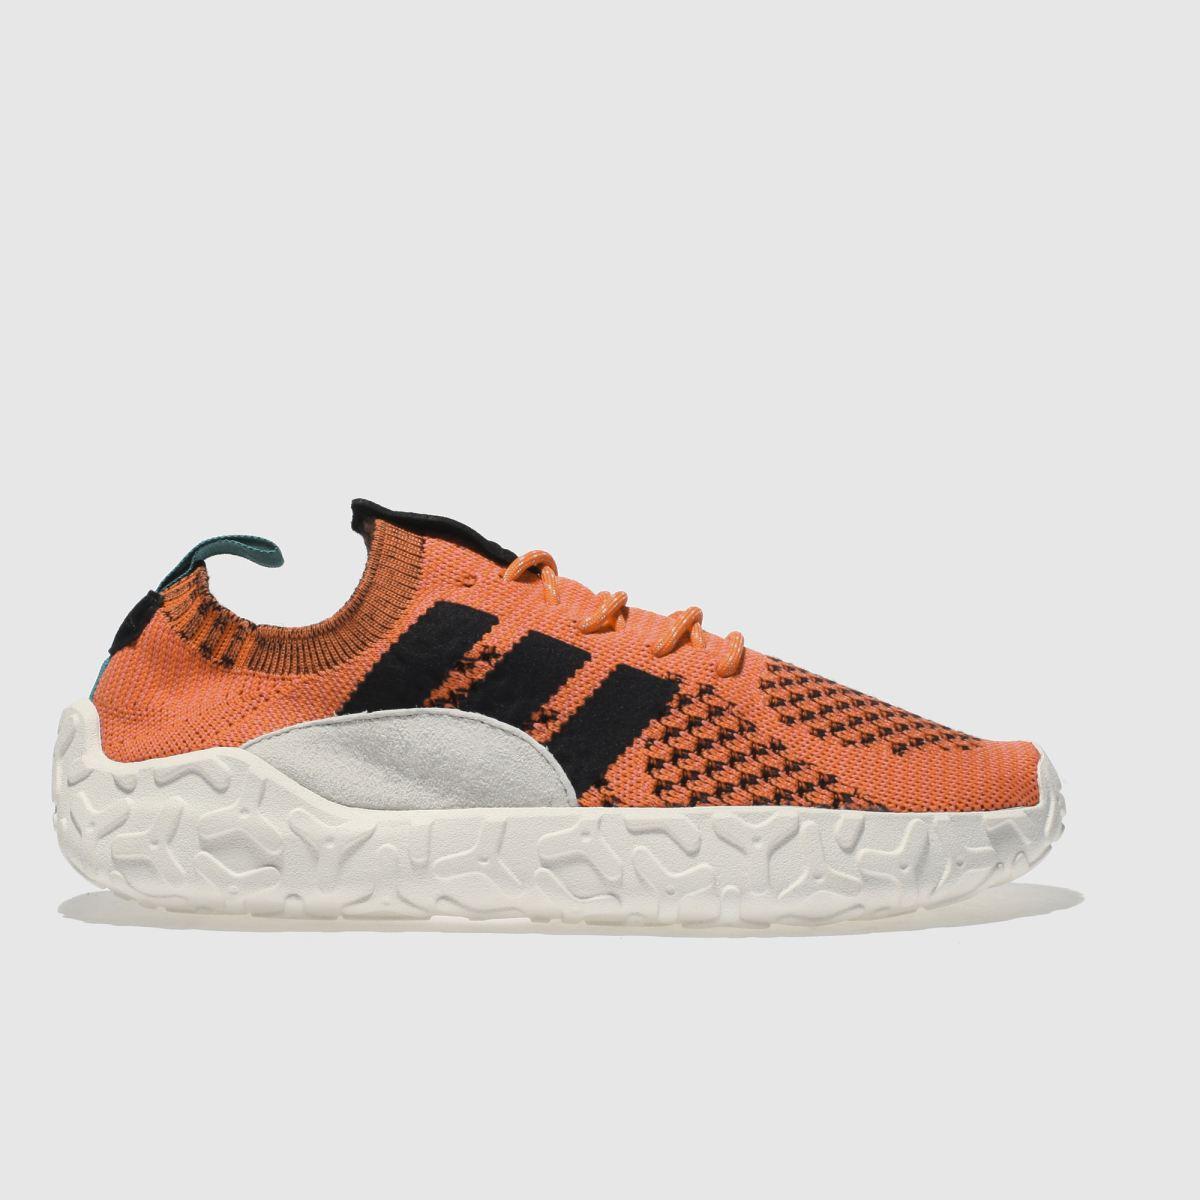 Adidas Orange Atric F/22 Primeknit Trainers